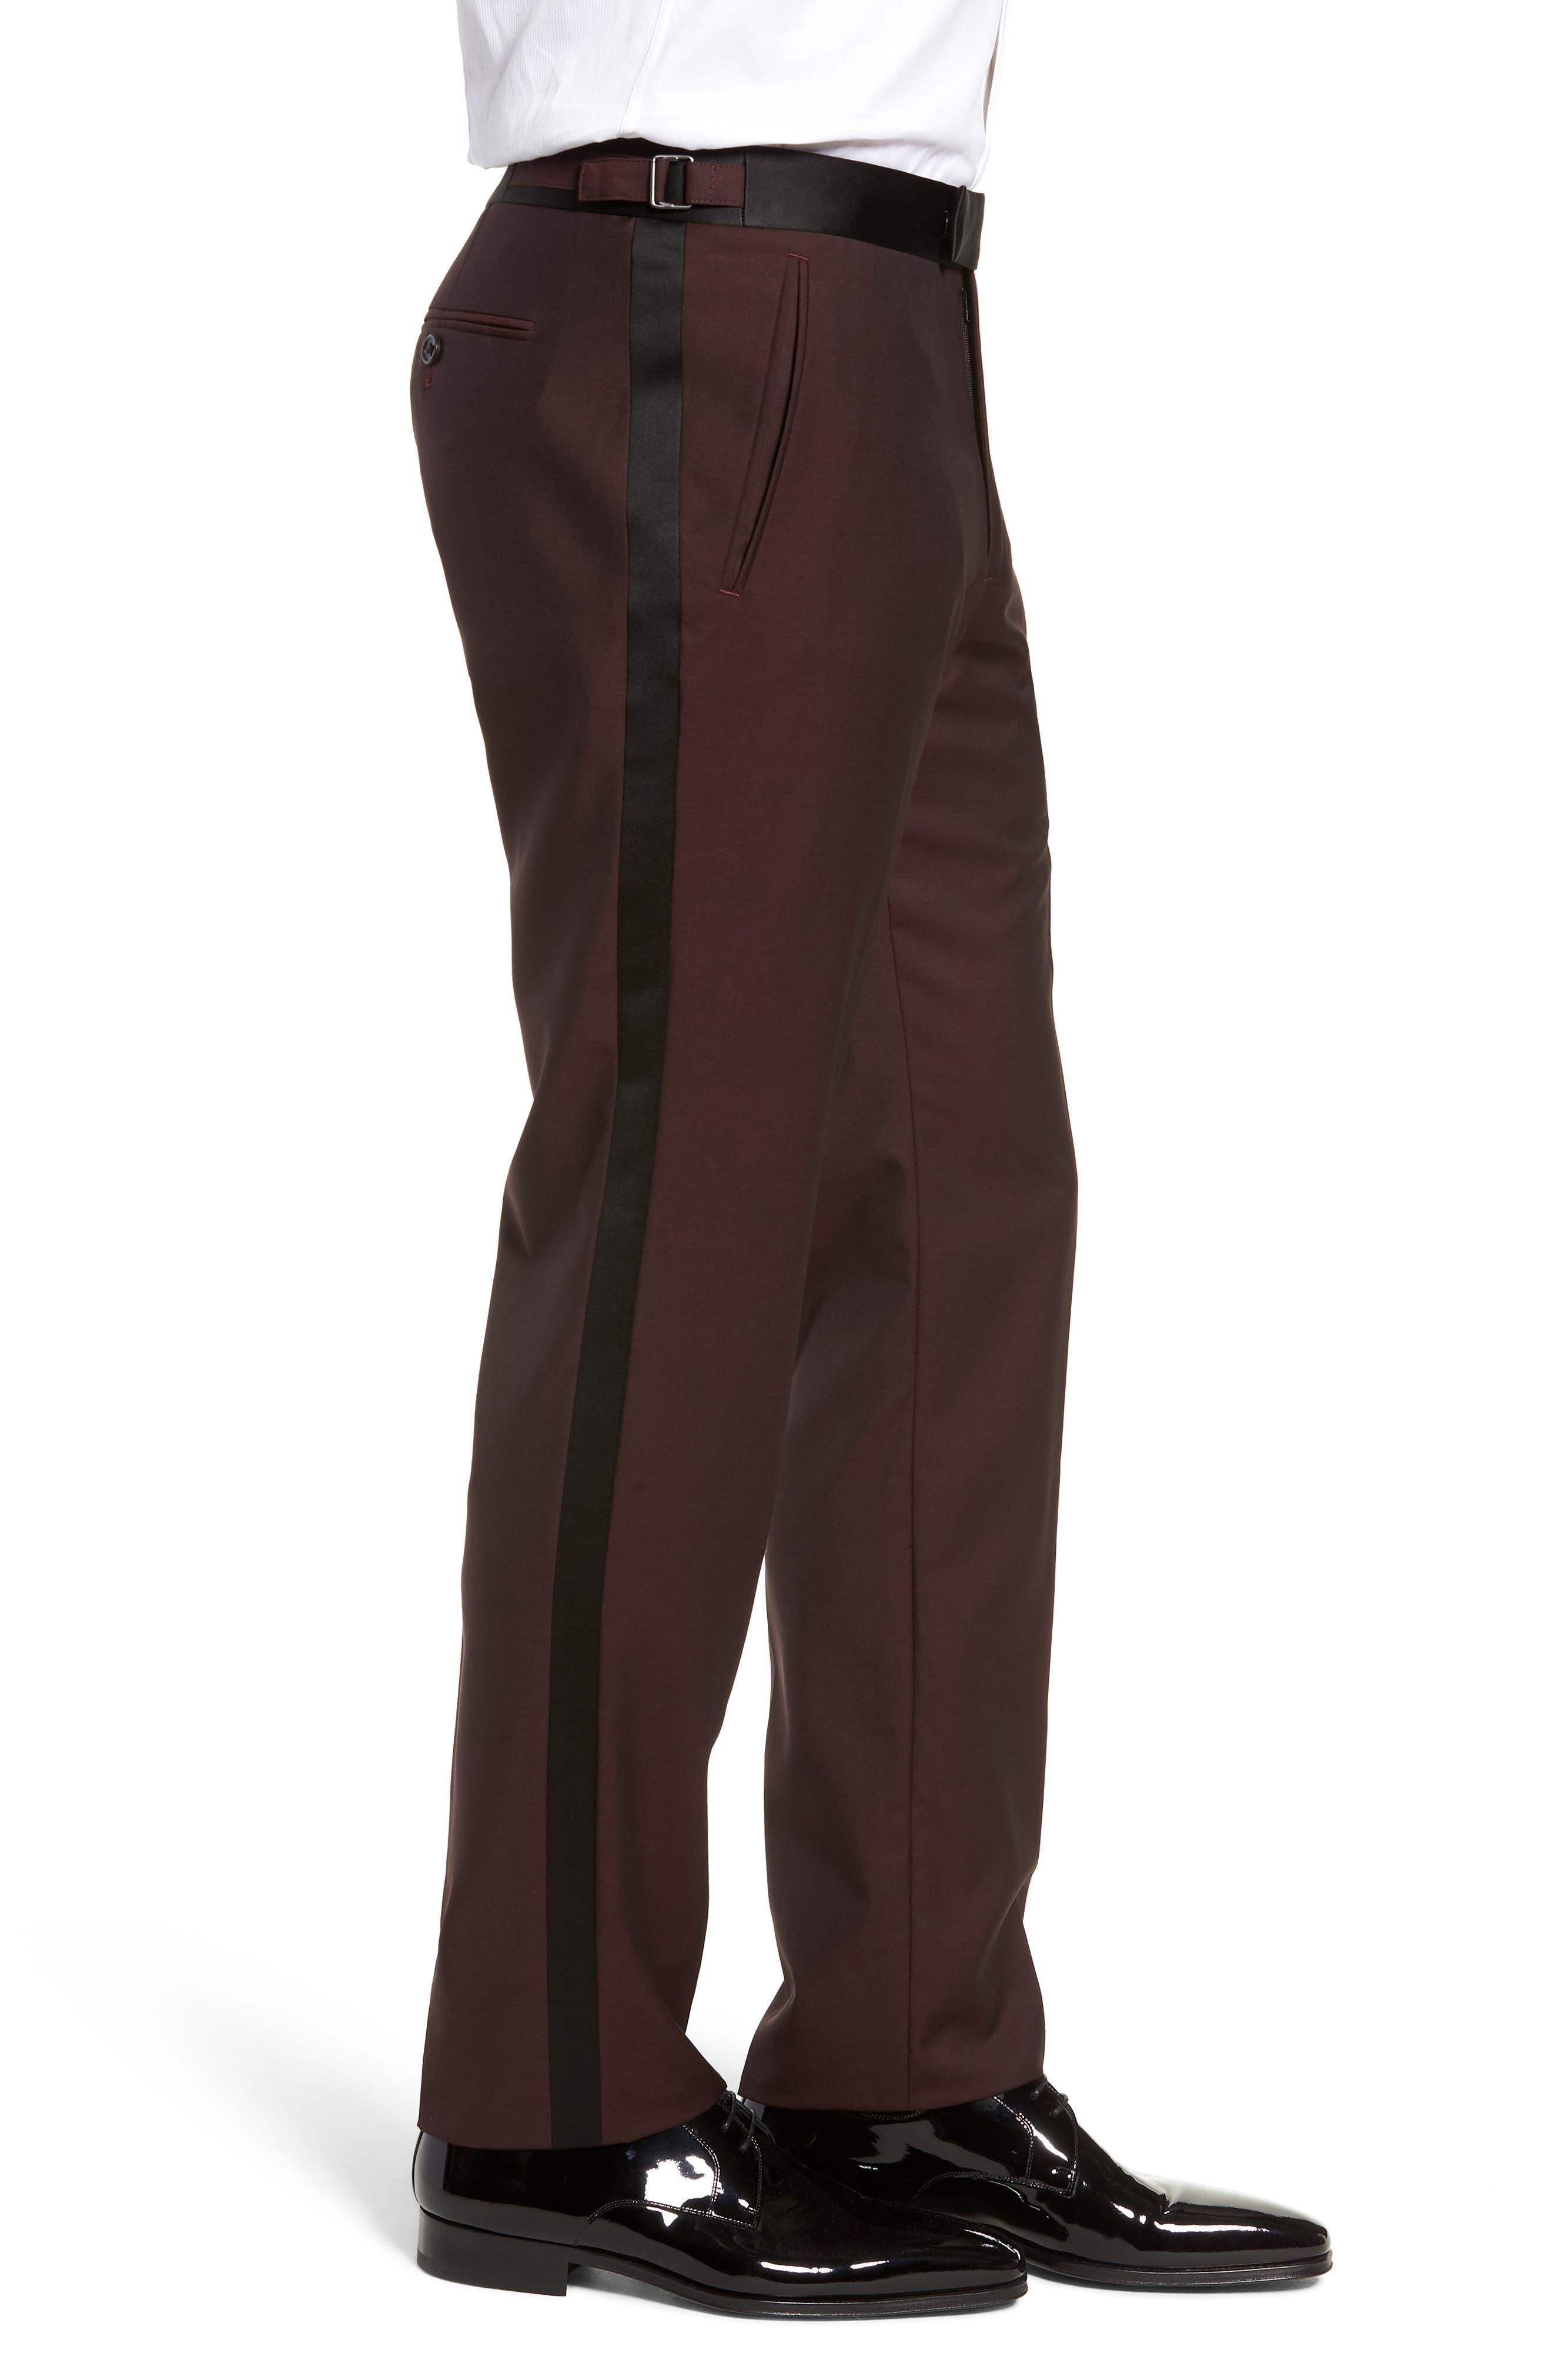 Capstone Slim Fit Tuxedo Trousers,                             Alternate thumbnail 3, color,                             MAROON